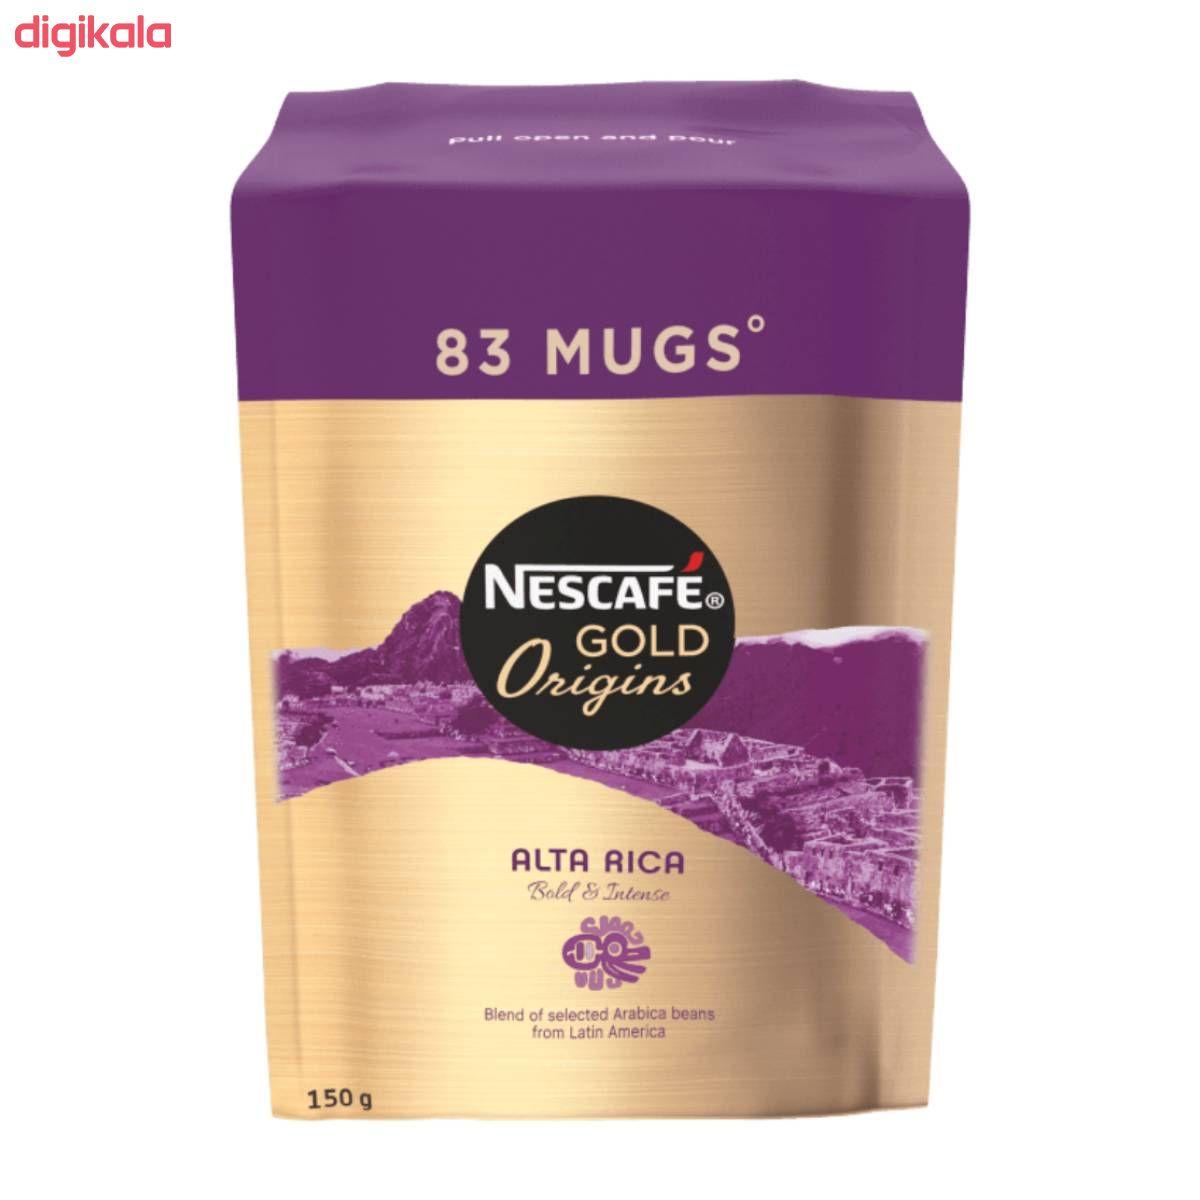 قهوه فوری آلتاریکا نسکافه - ۱۵۰ گرم main 1 1